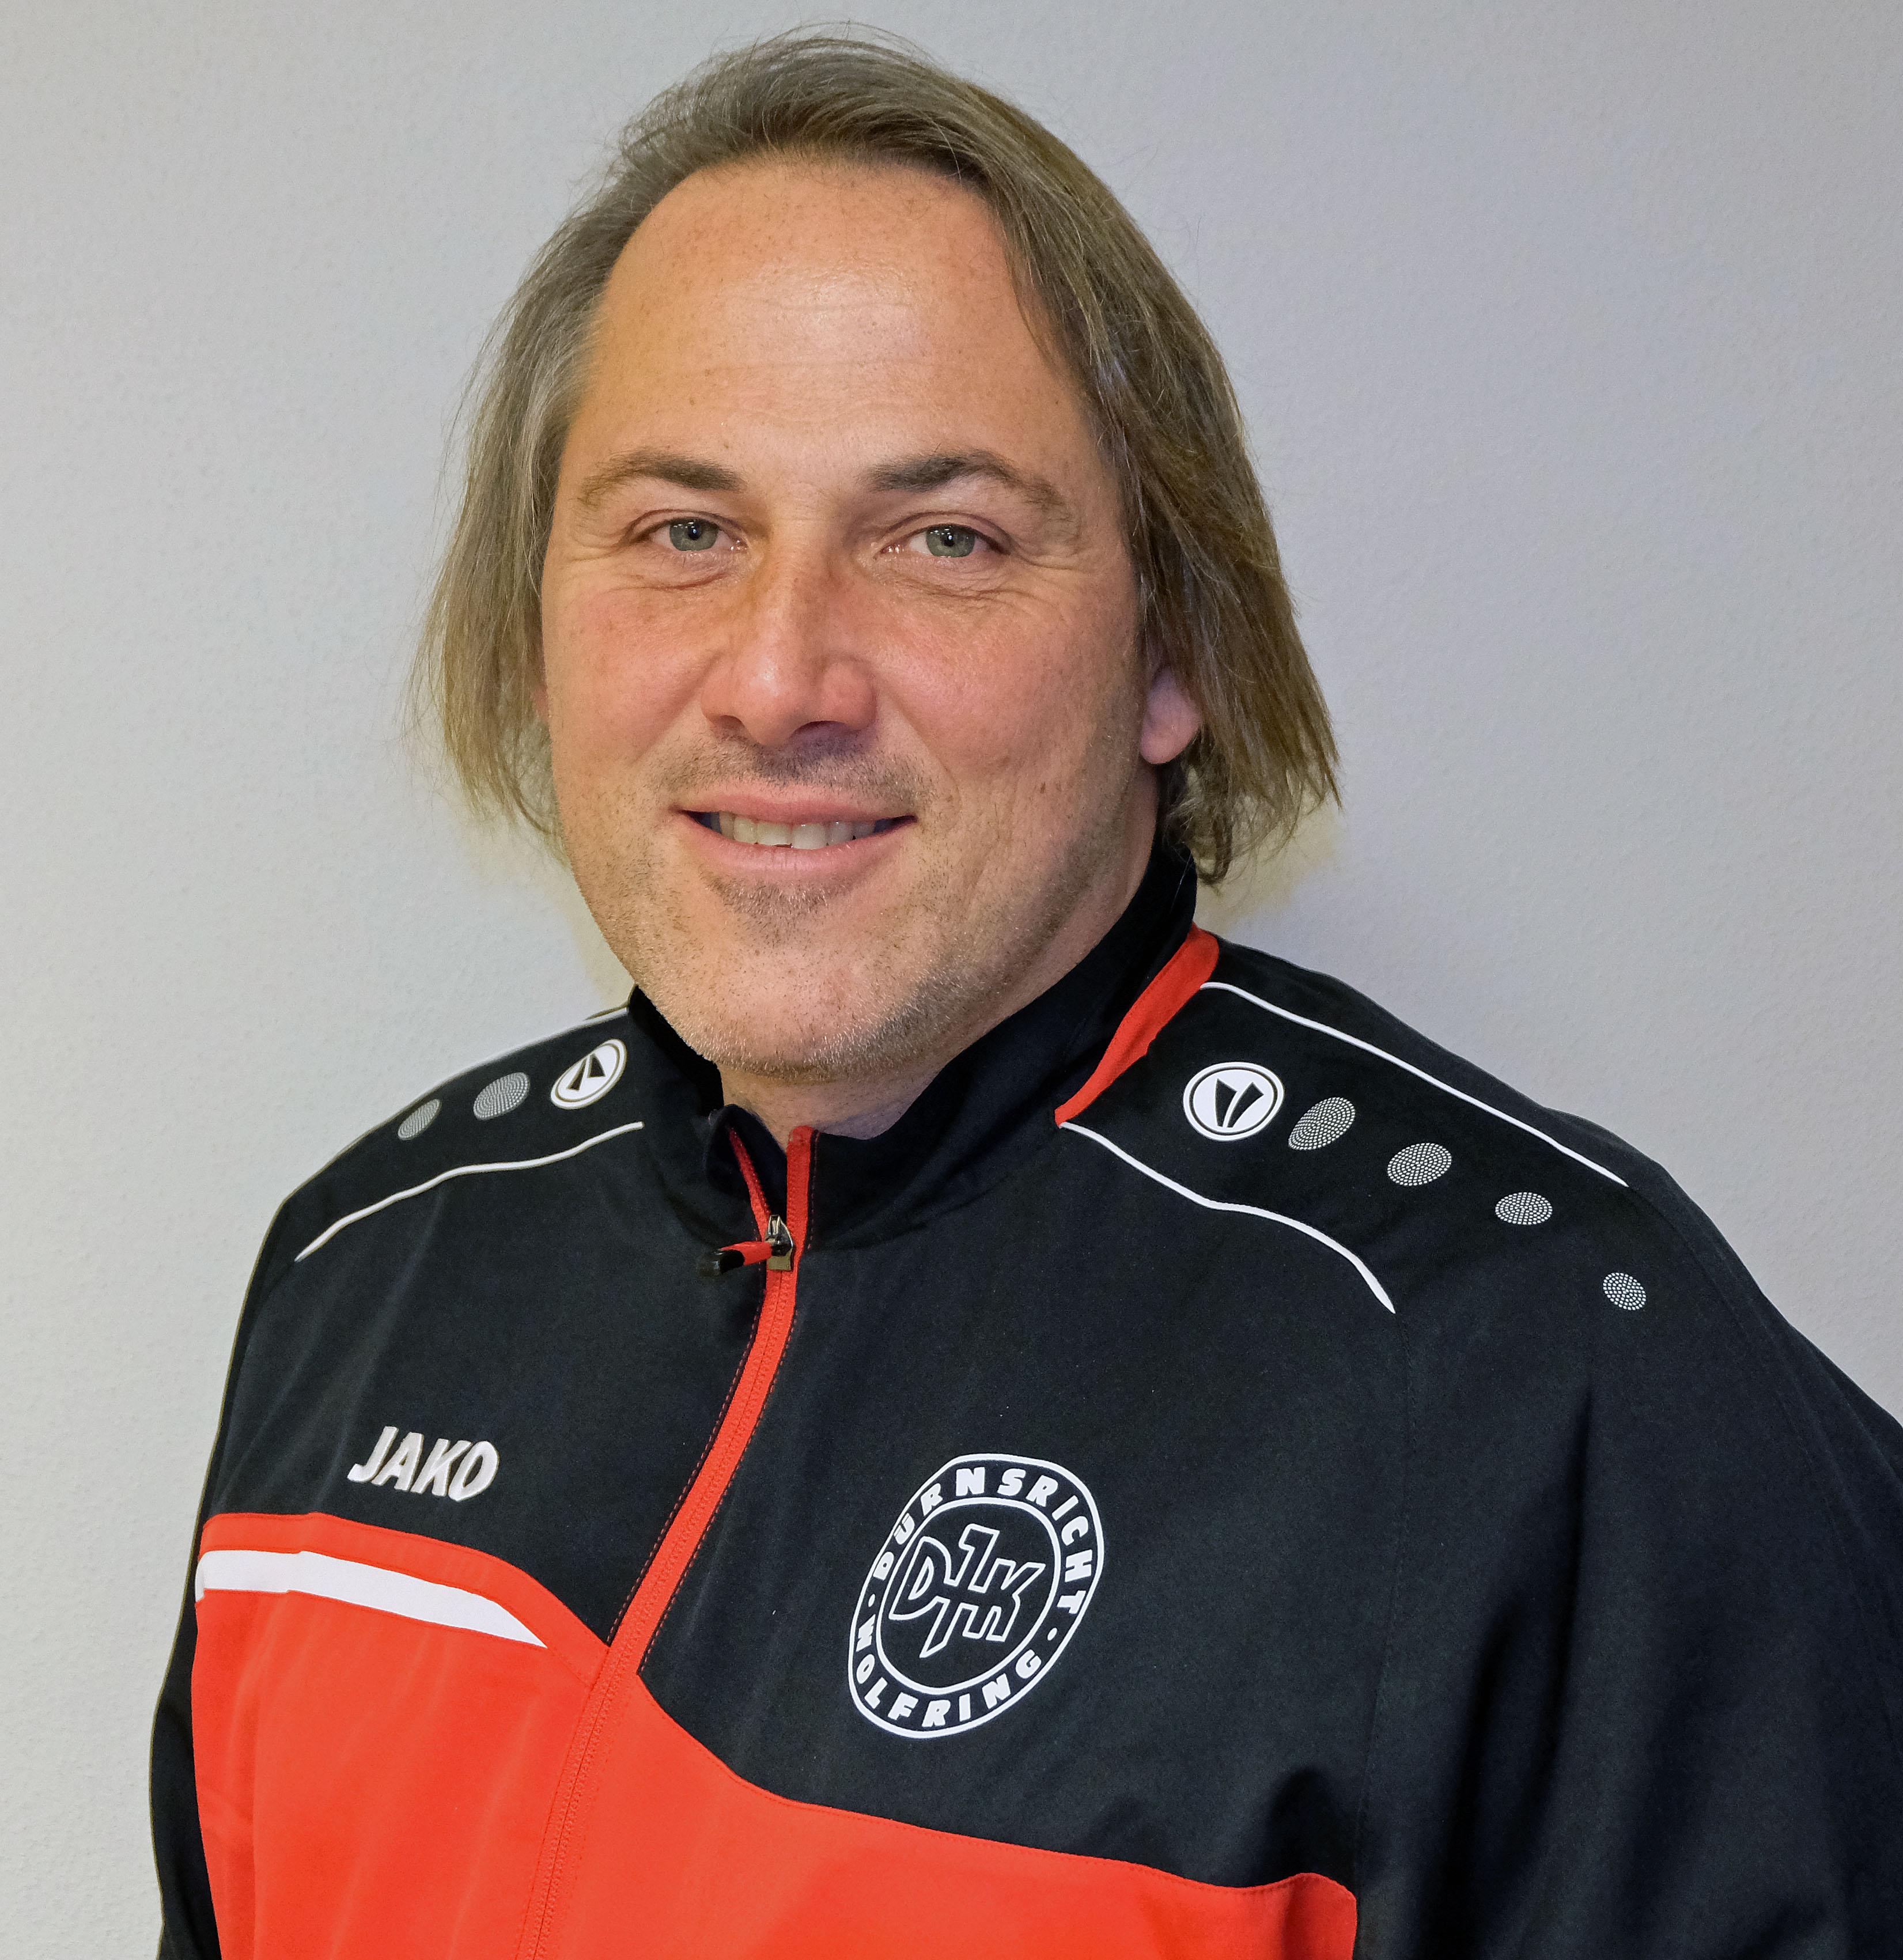 Lorenz Joachim